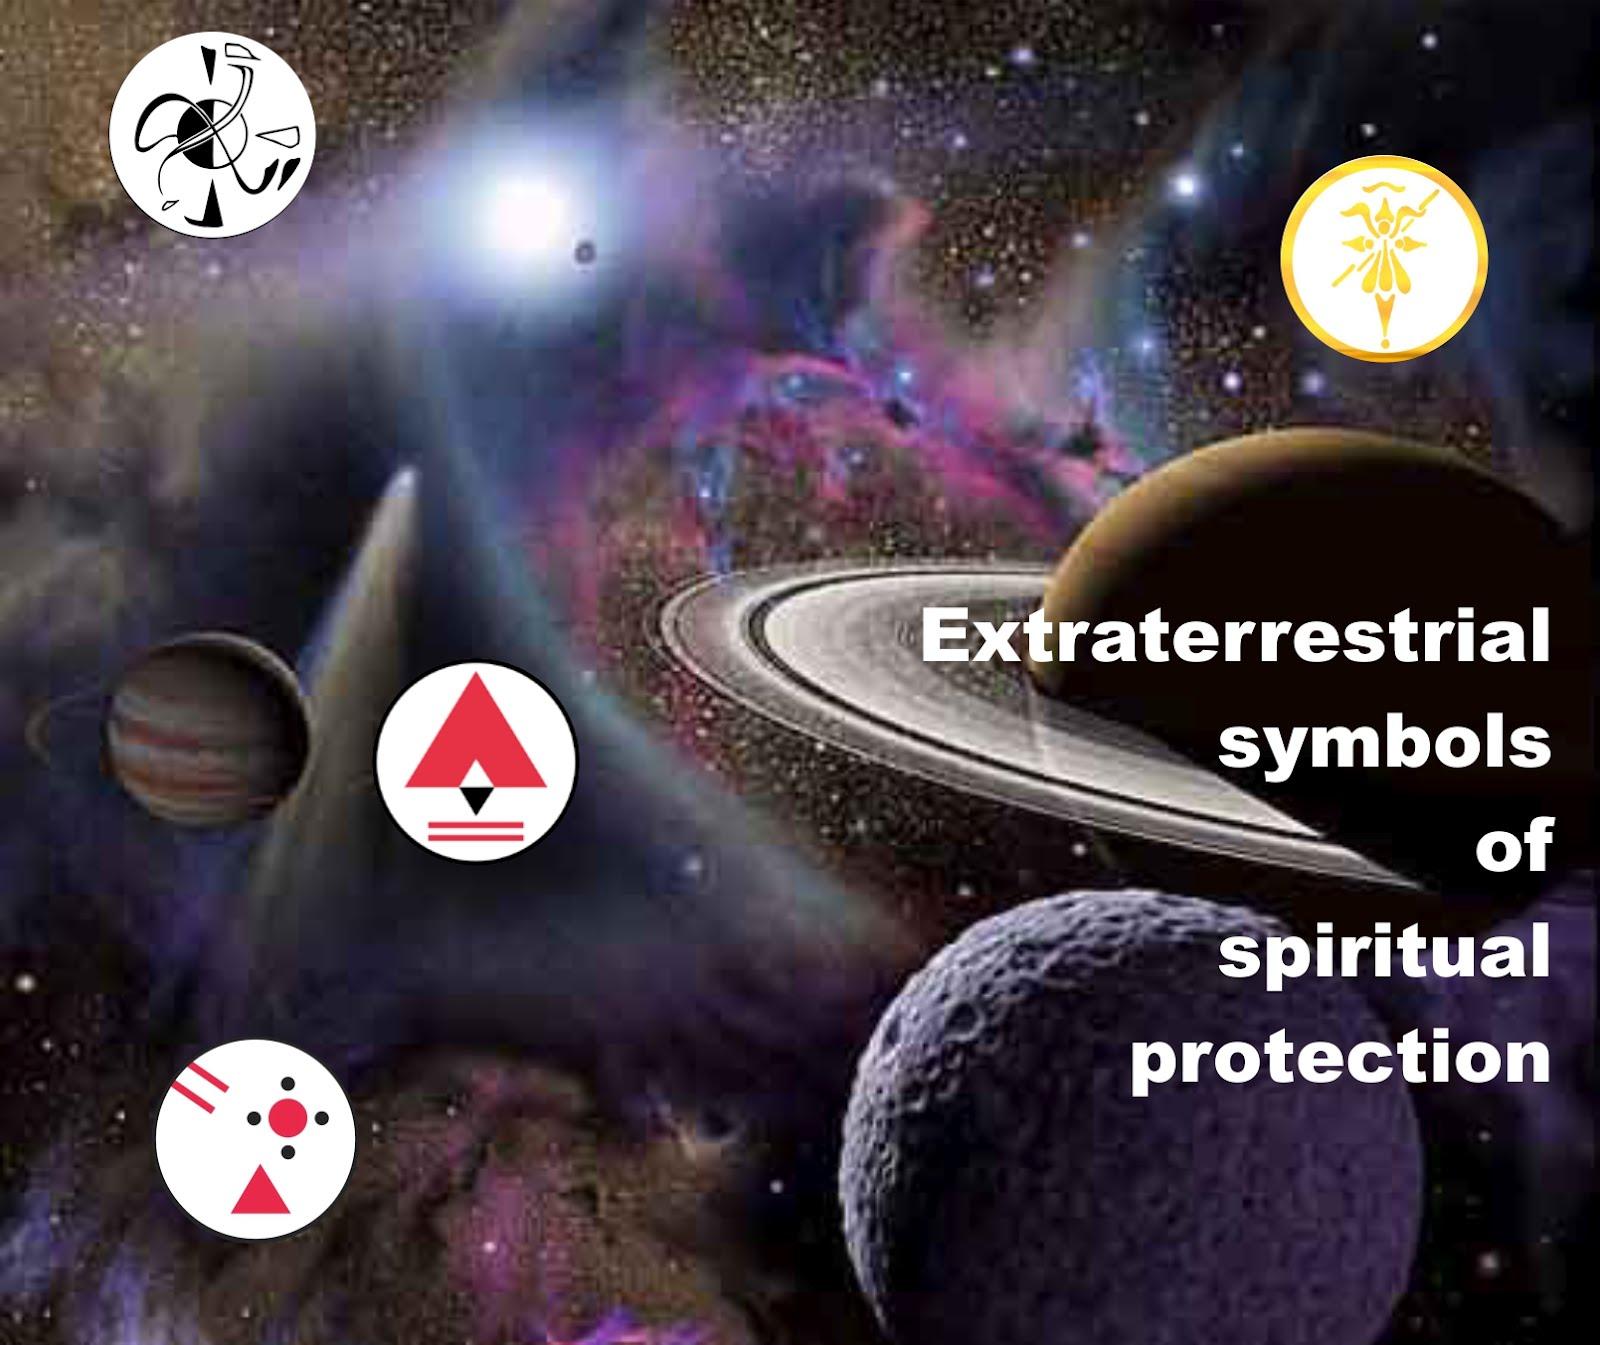 http://alcuinbramerton.blogspot.com/2004/12/extraterrestrial-symbols-of-spiritual.html